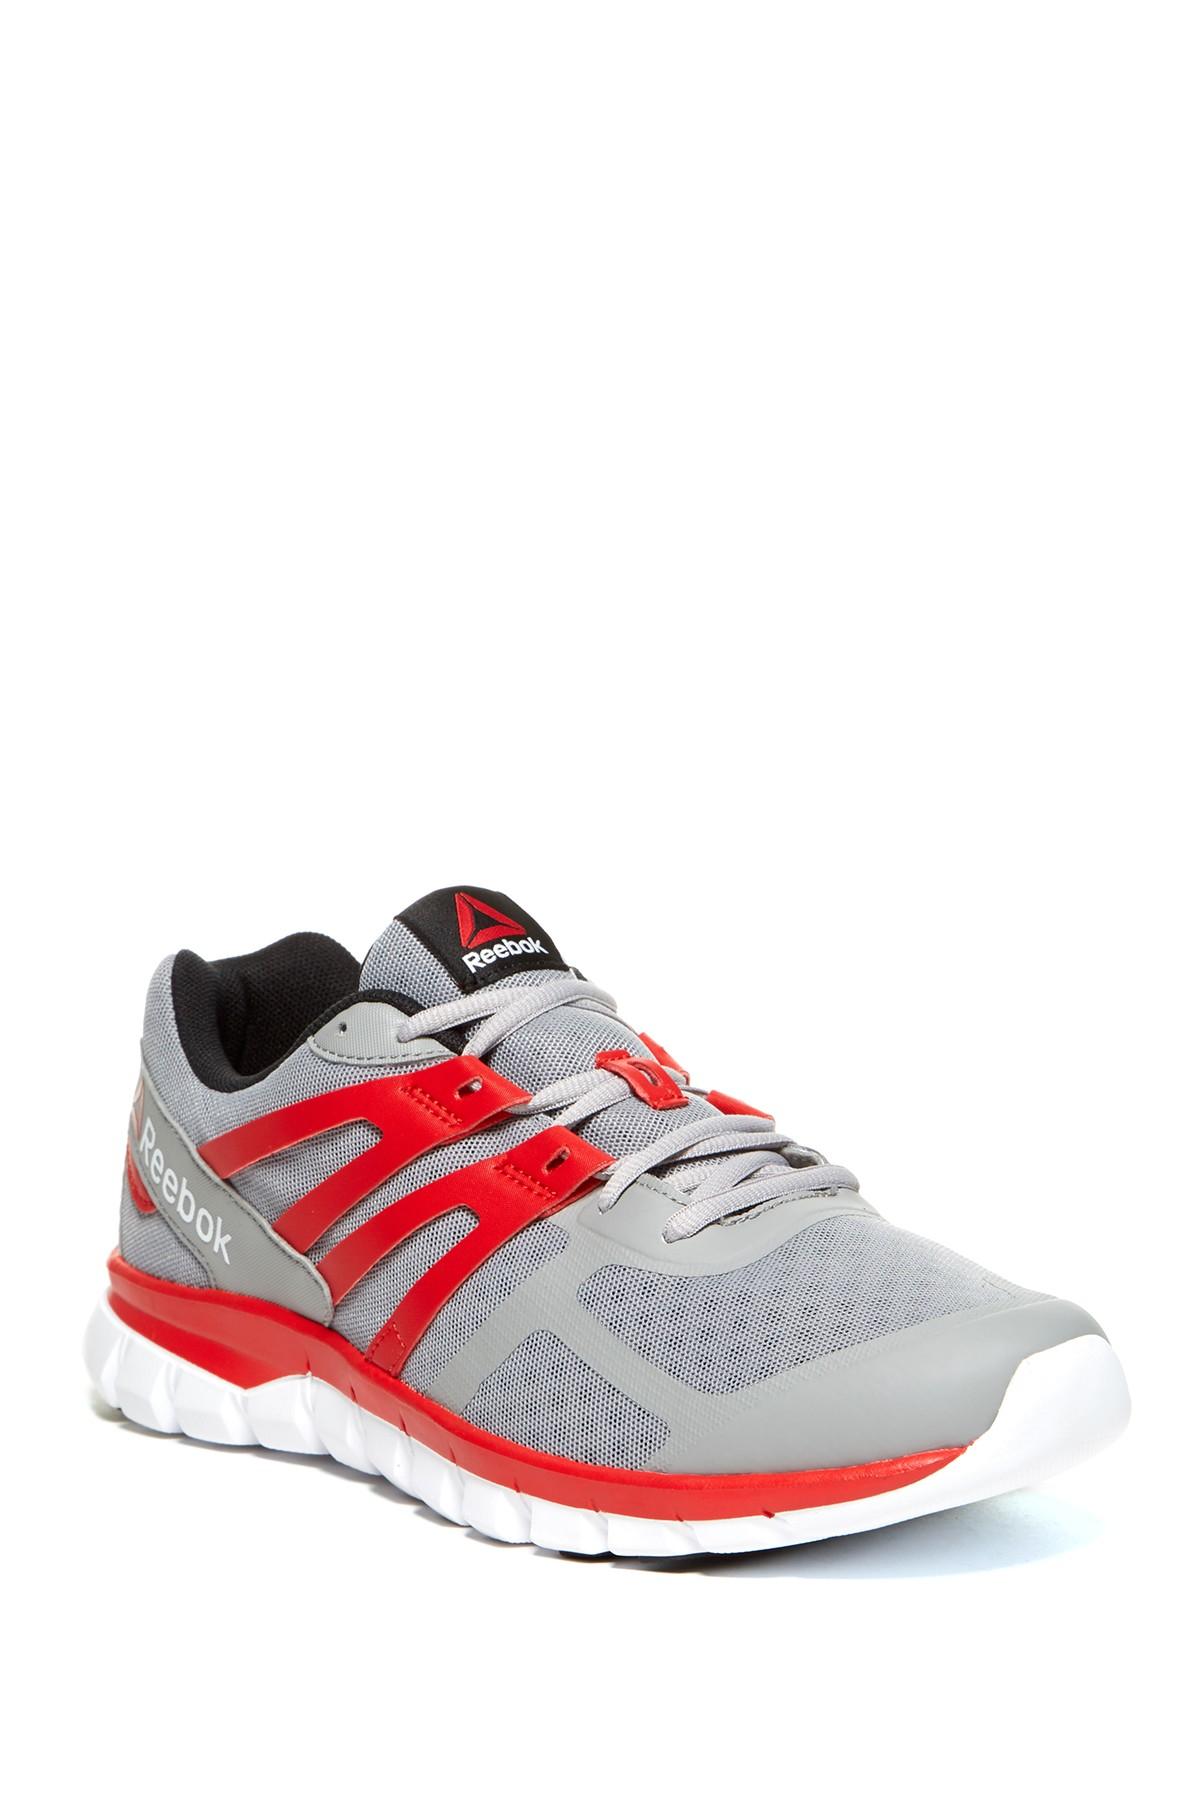 Reebok Womens Sublite Xt Cushion   Mt Running Shoes